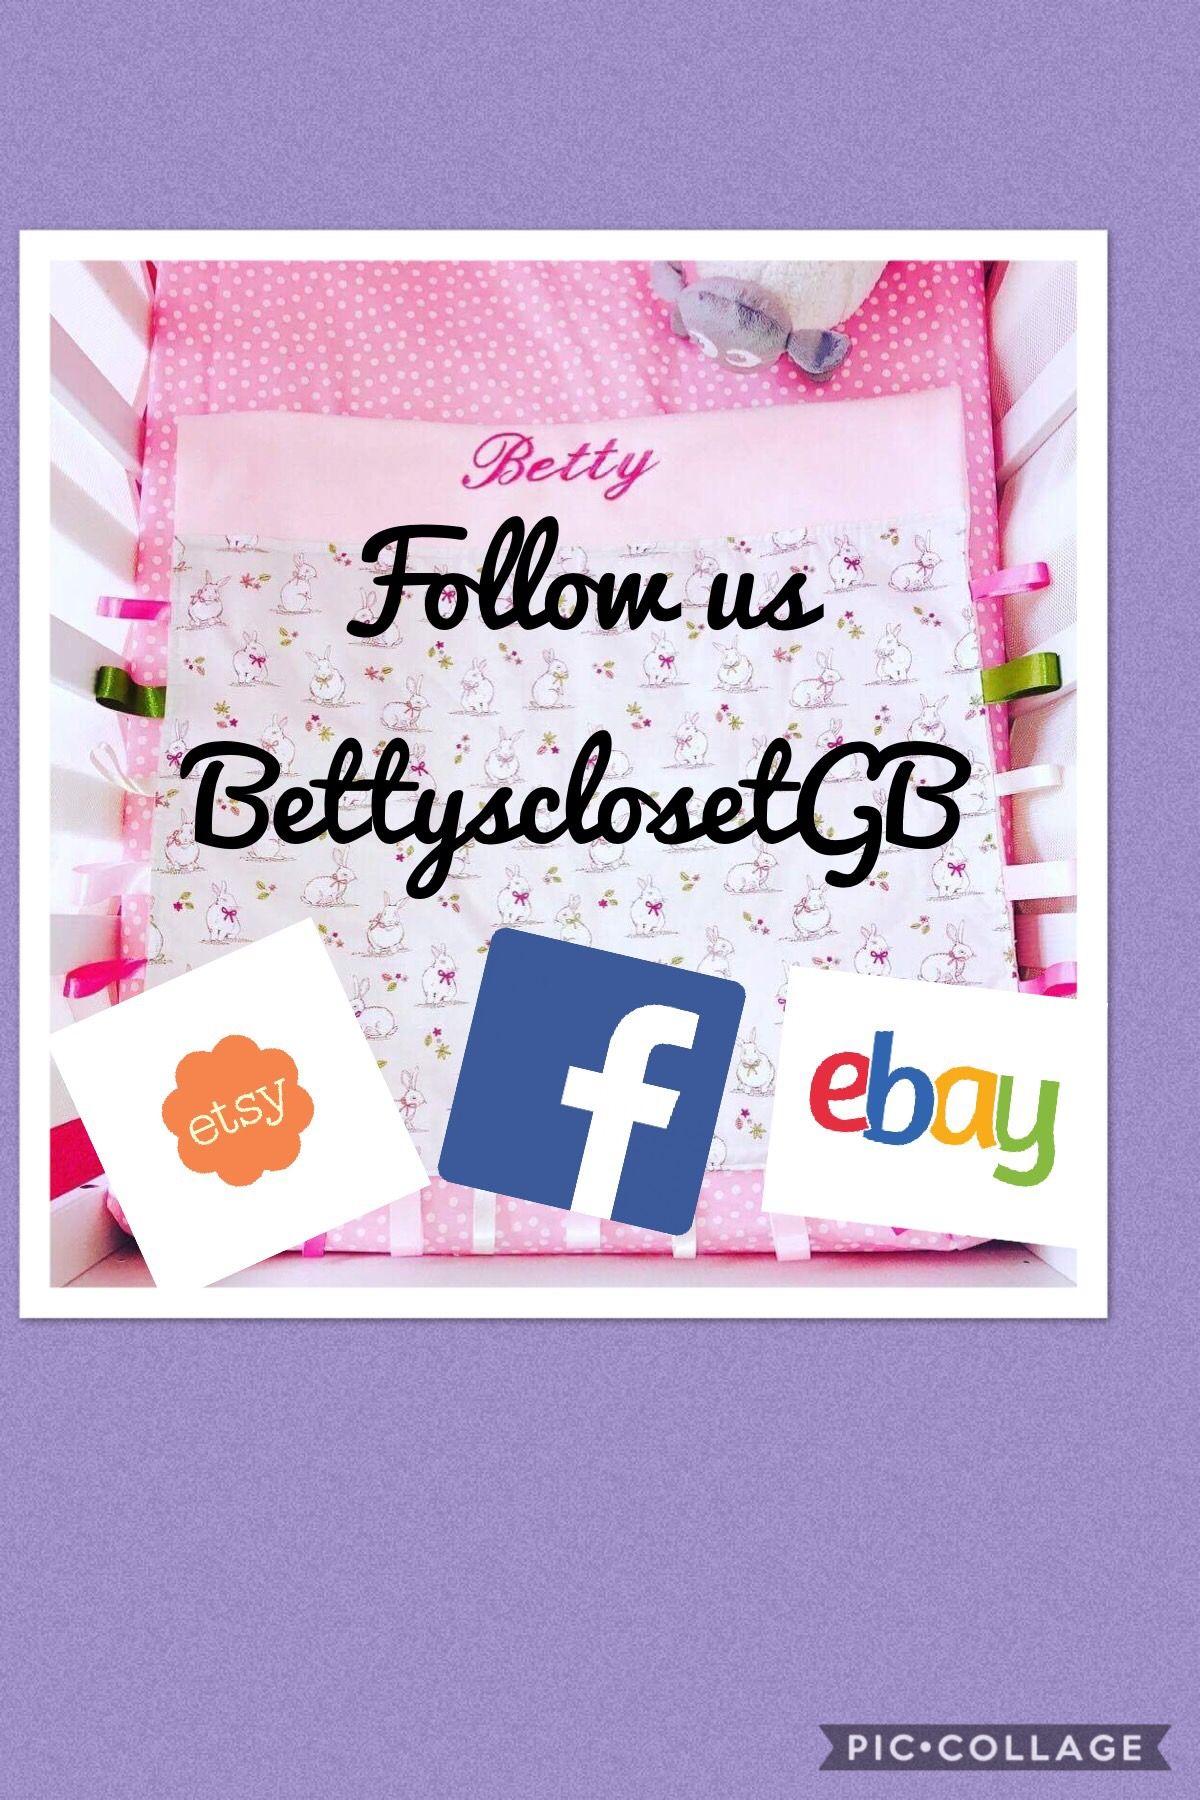 Bettysclosetgb Image By Angela Priestley